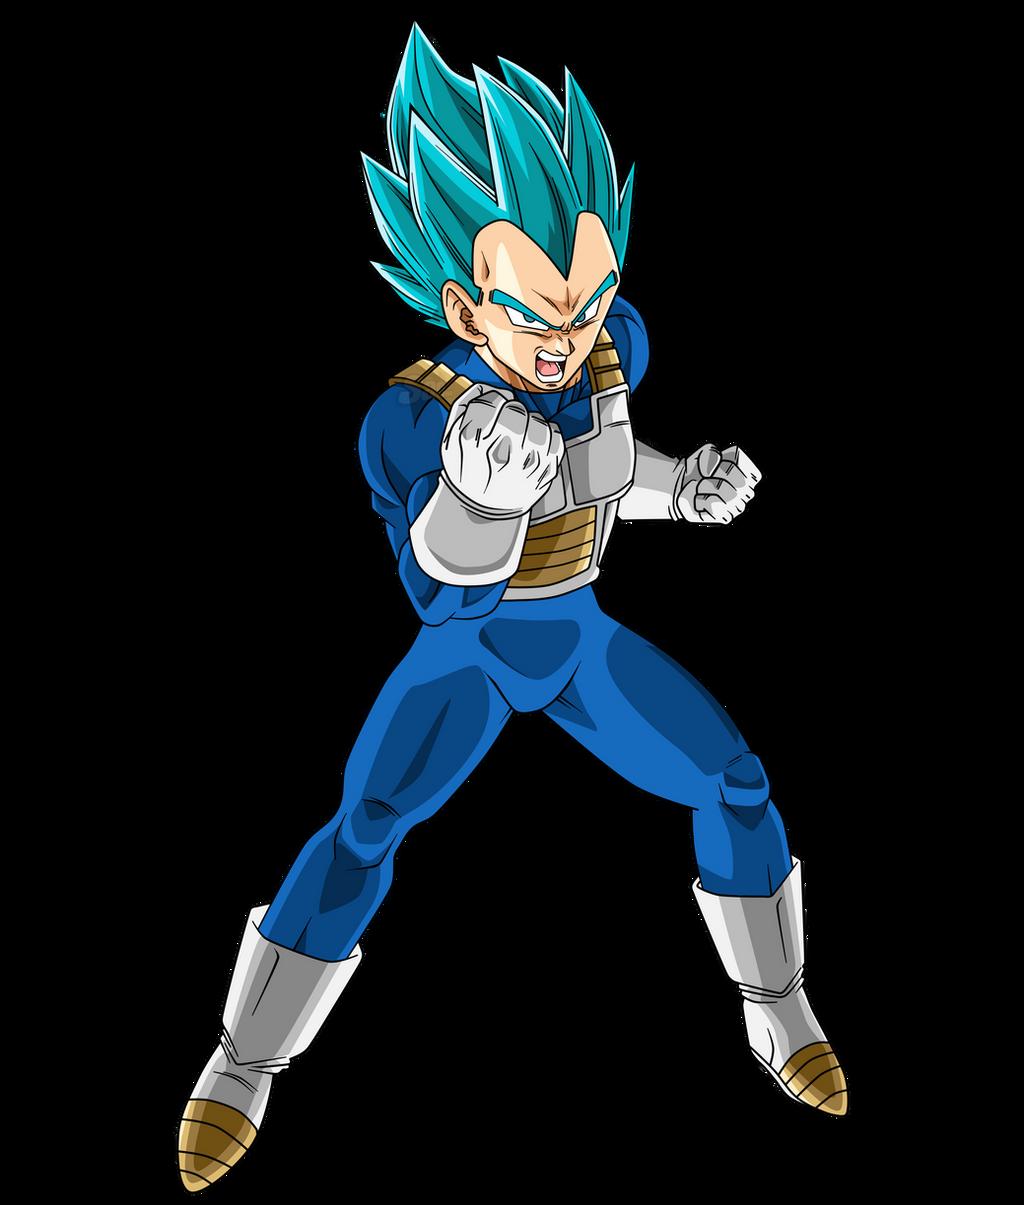 Vegeta ssj blue 5 by saodvd on deviantart - Vegeta super sayen 2 ...